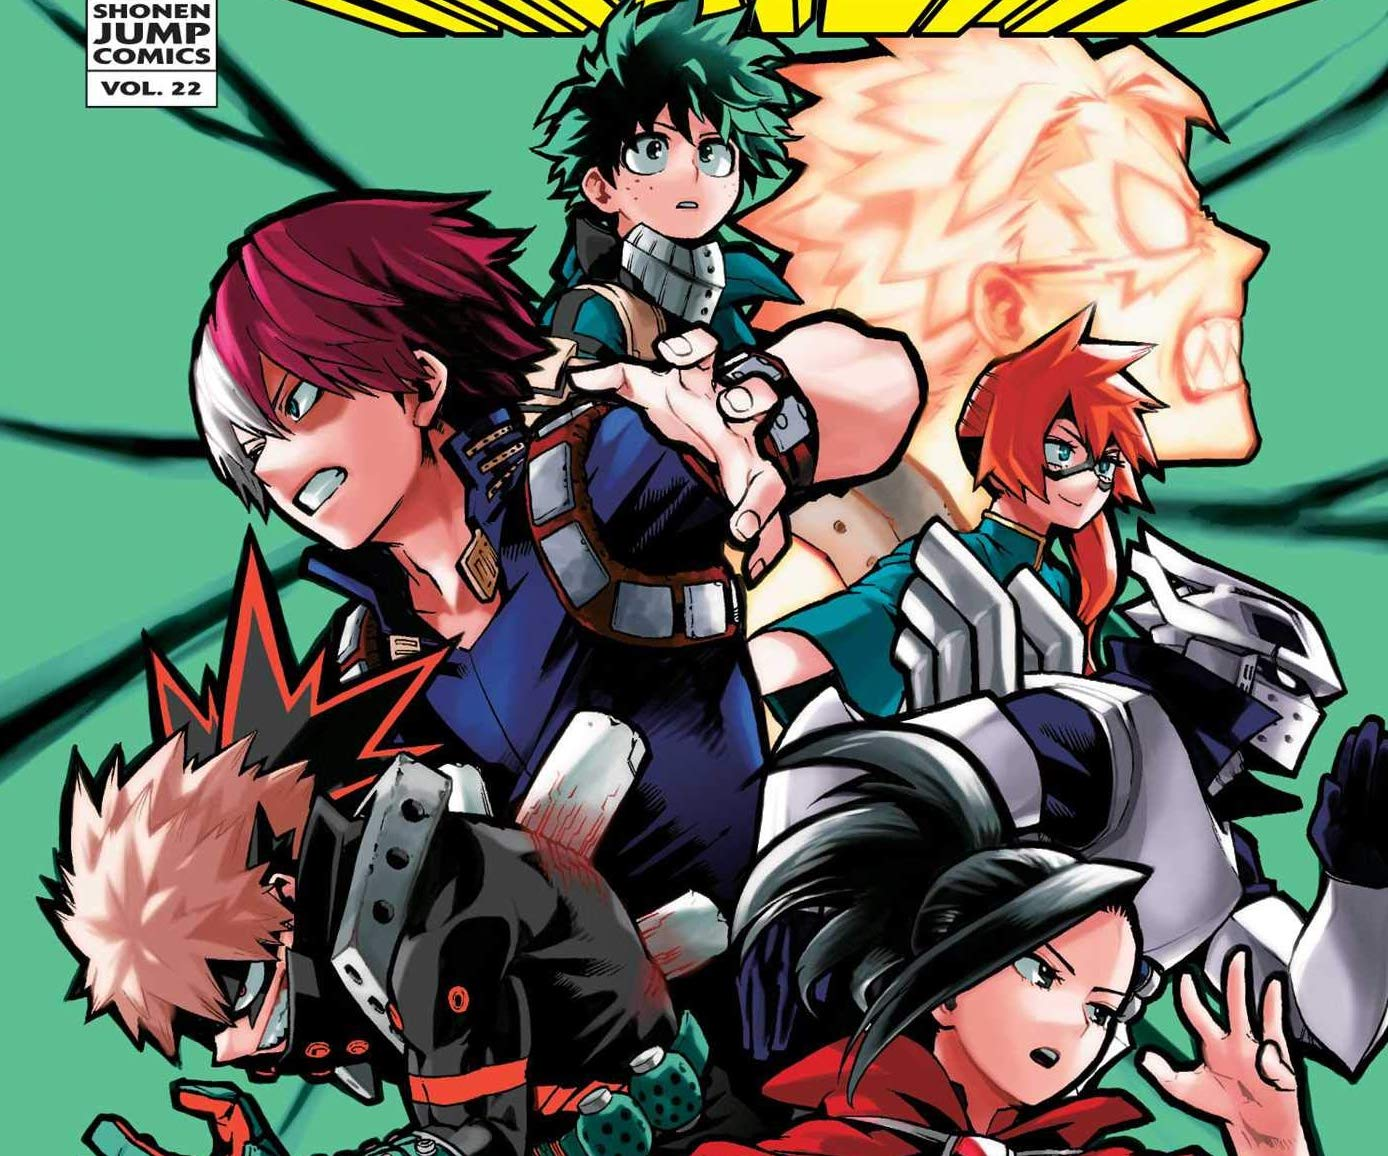 My Hero Academia Vol. 22 Review